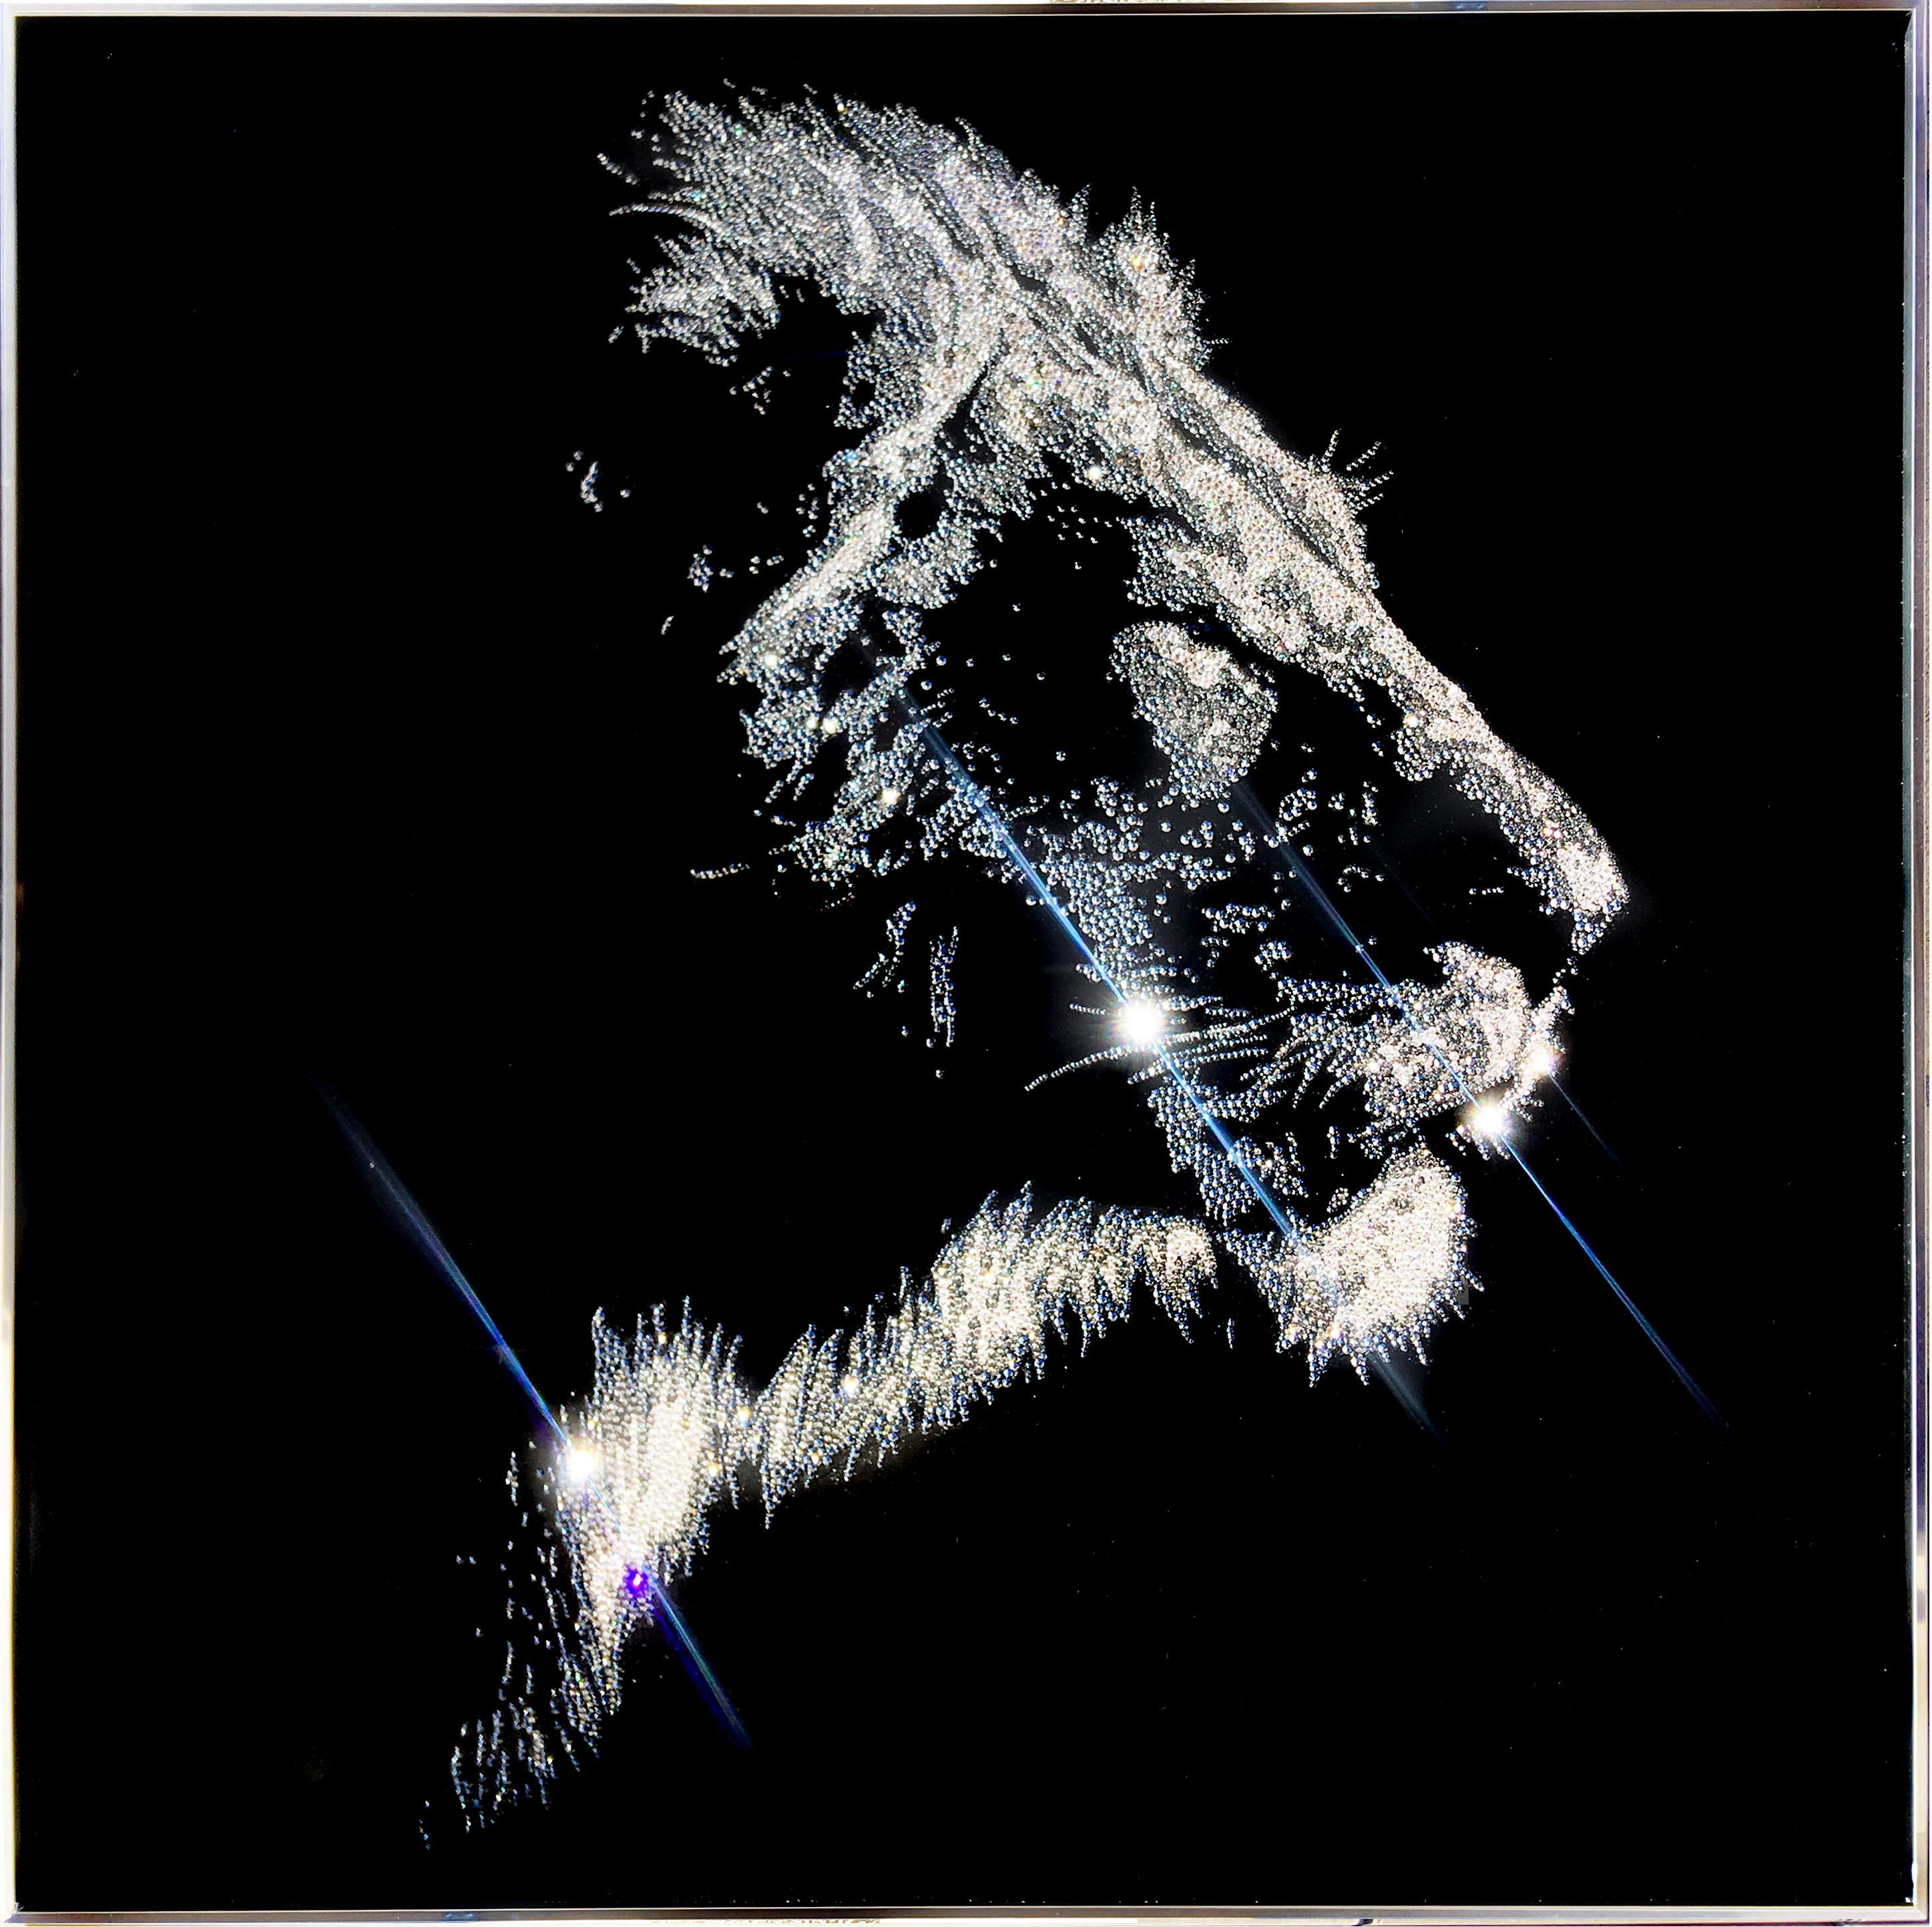 Manes in the wind, 10600 Crystals from Swarovski® su plexiglas, 80x80 cm. 2019